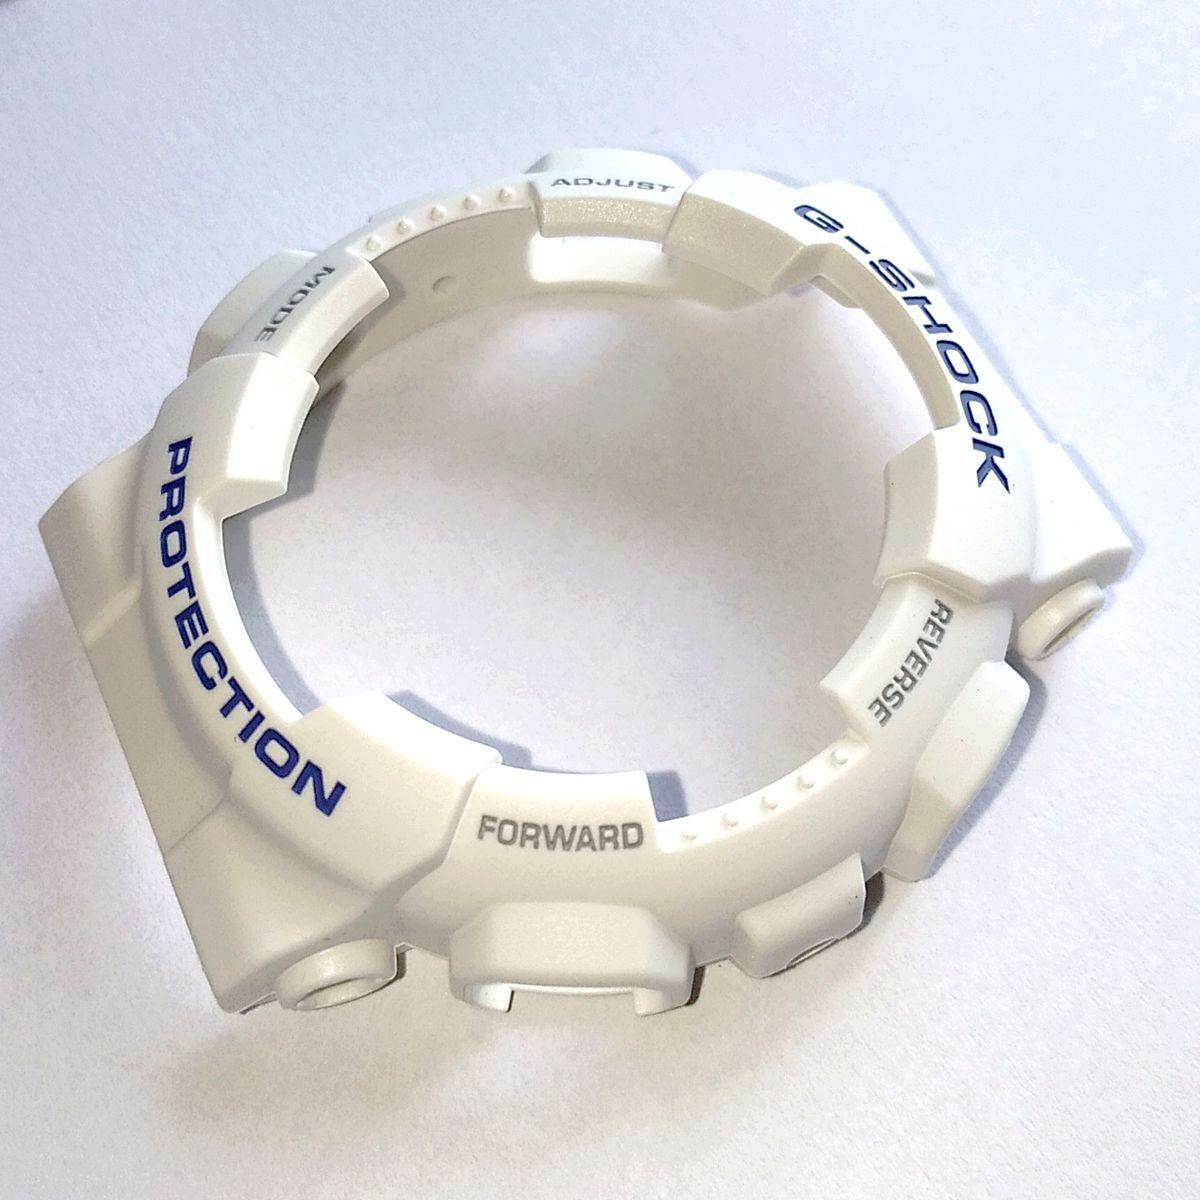 Bezel Casio G-shock Branco Fosco GA-110WB-7A  - E-Presentes